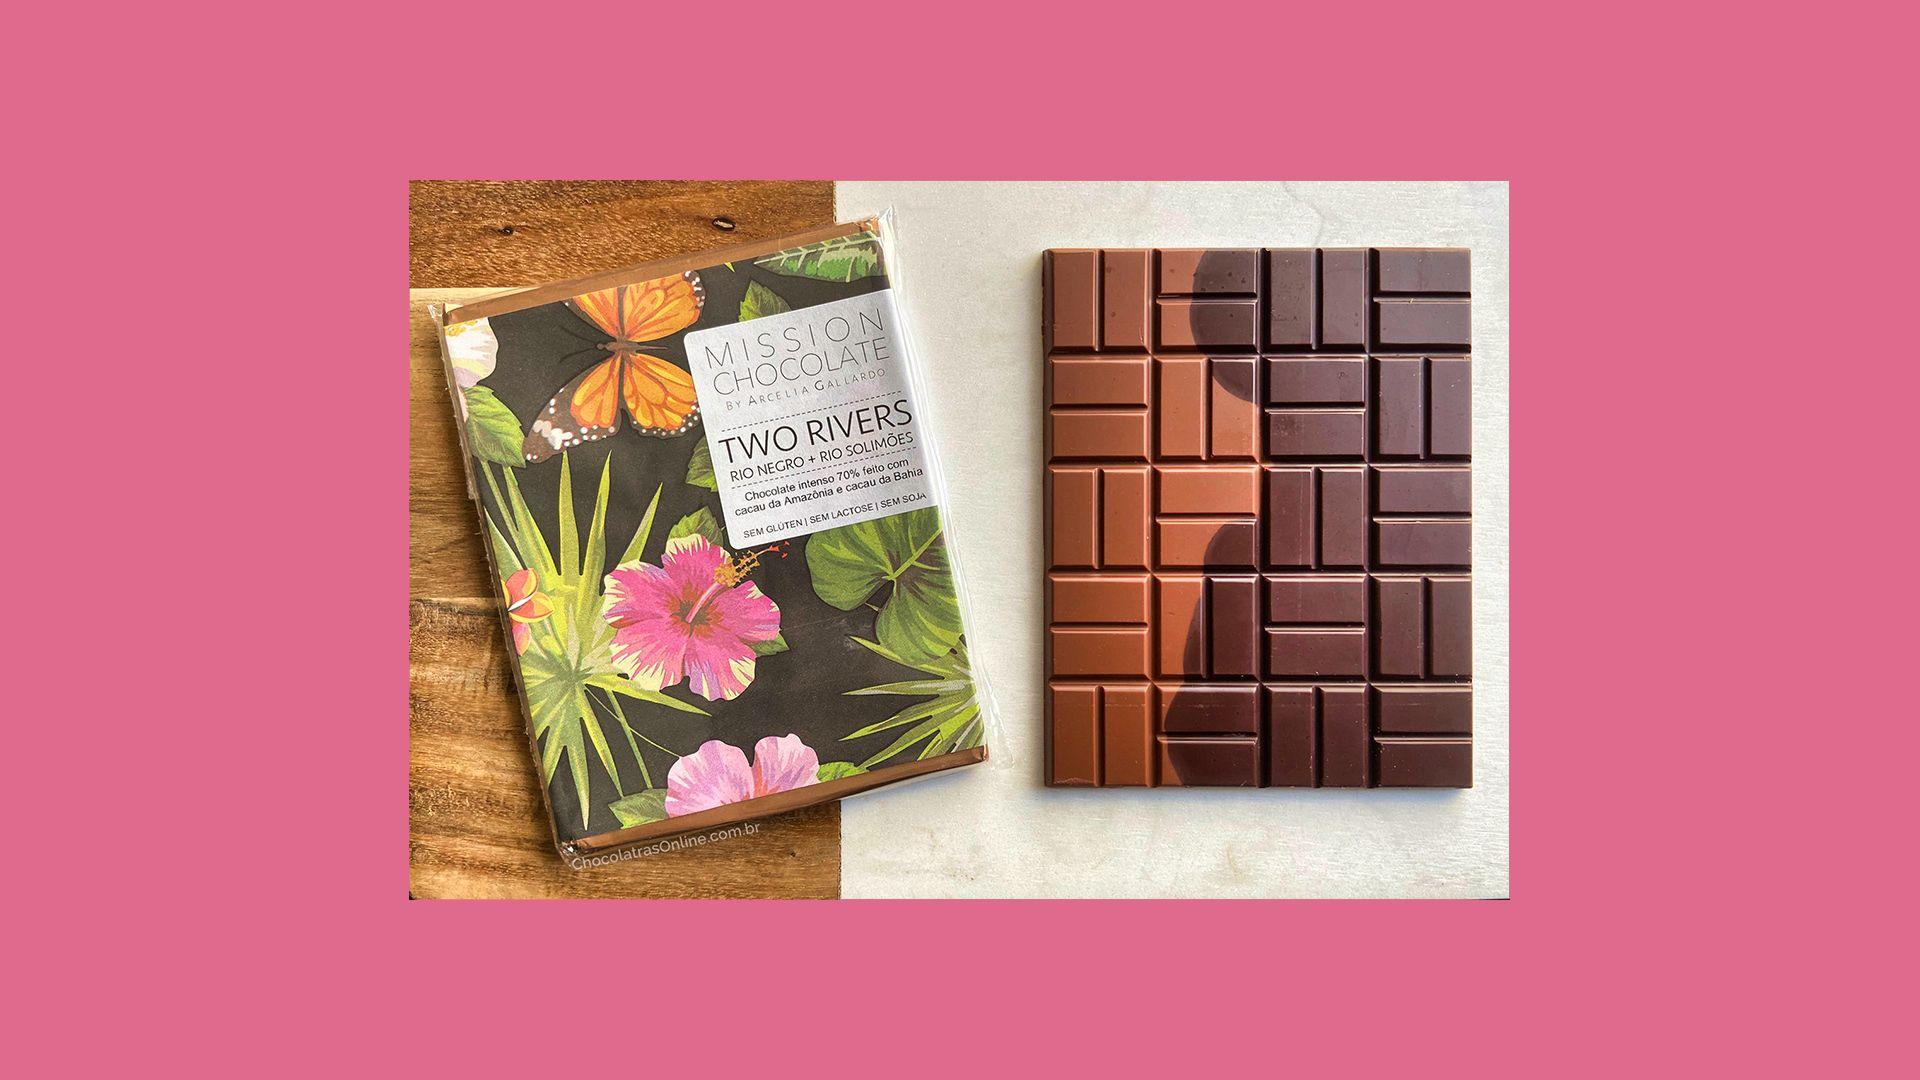 Dois Rios and a Chocolate Bar